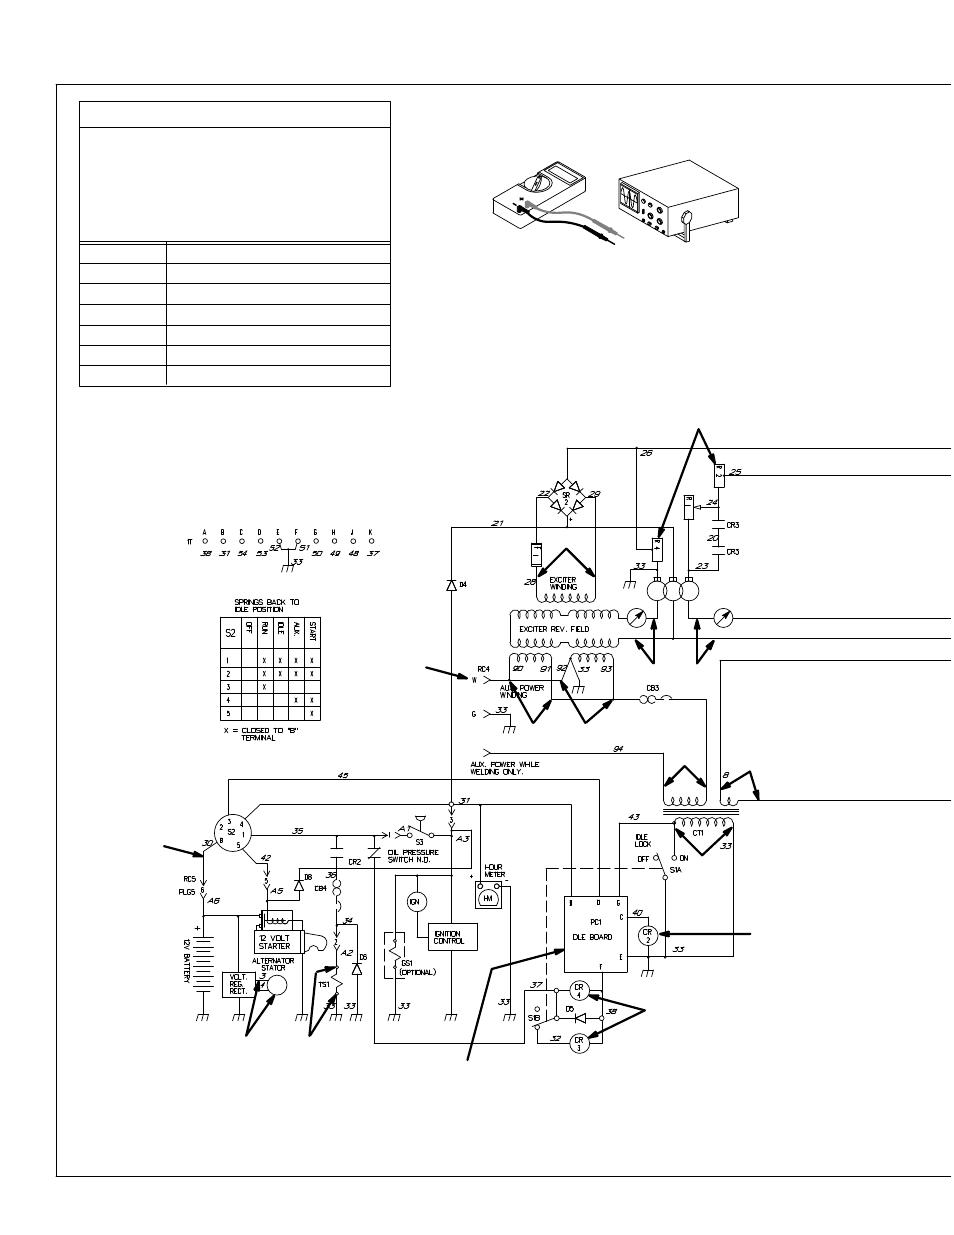 Wiring Diagram For Millermatic - Wiring Diagram Schemas